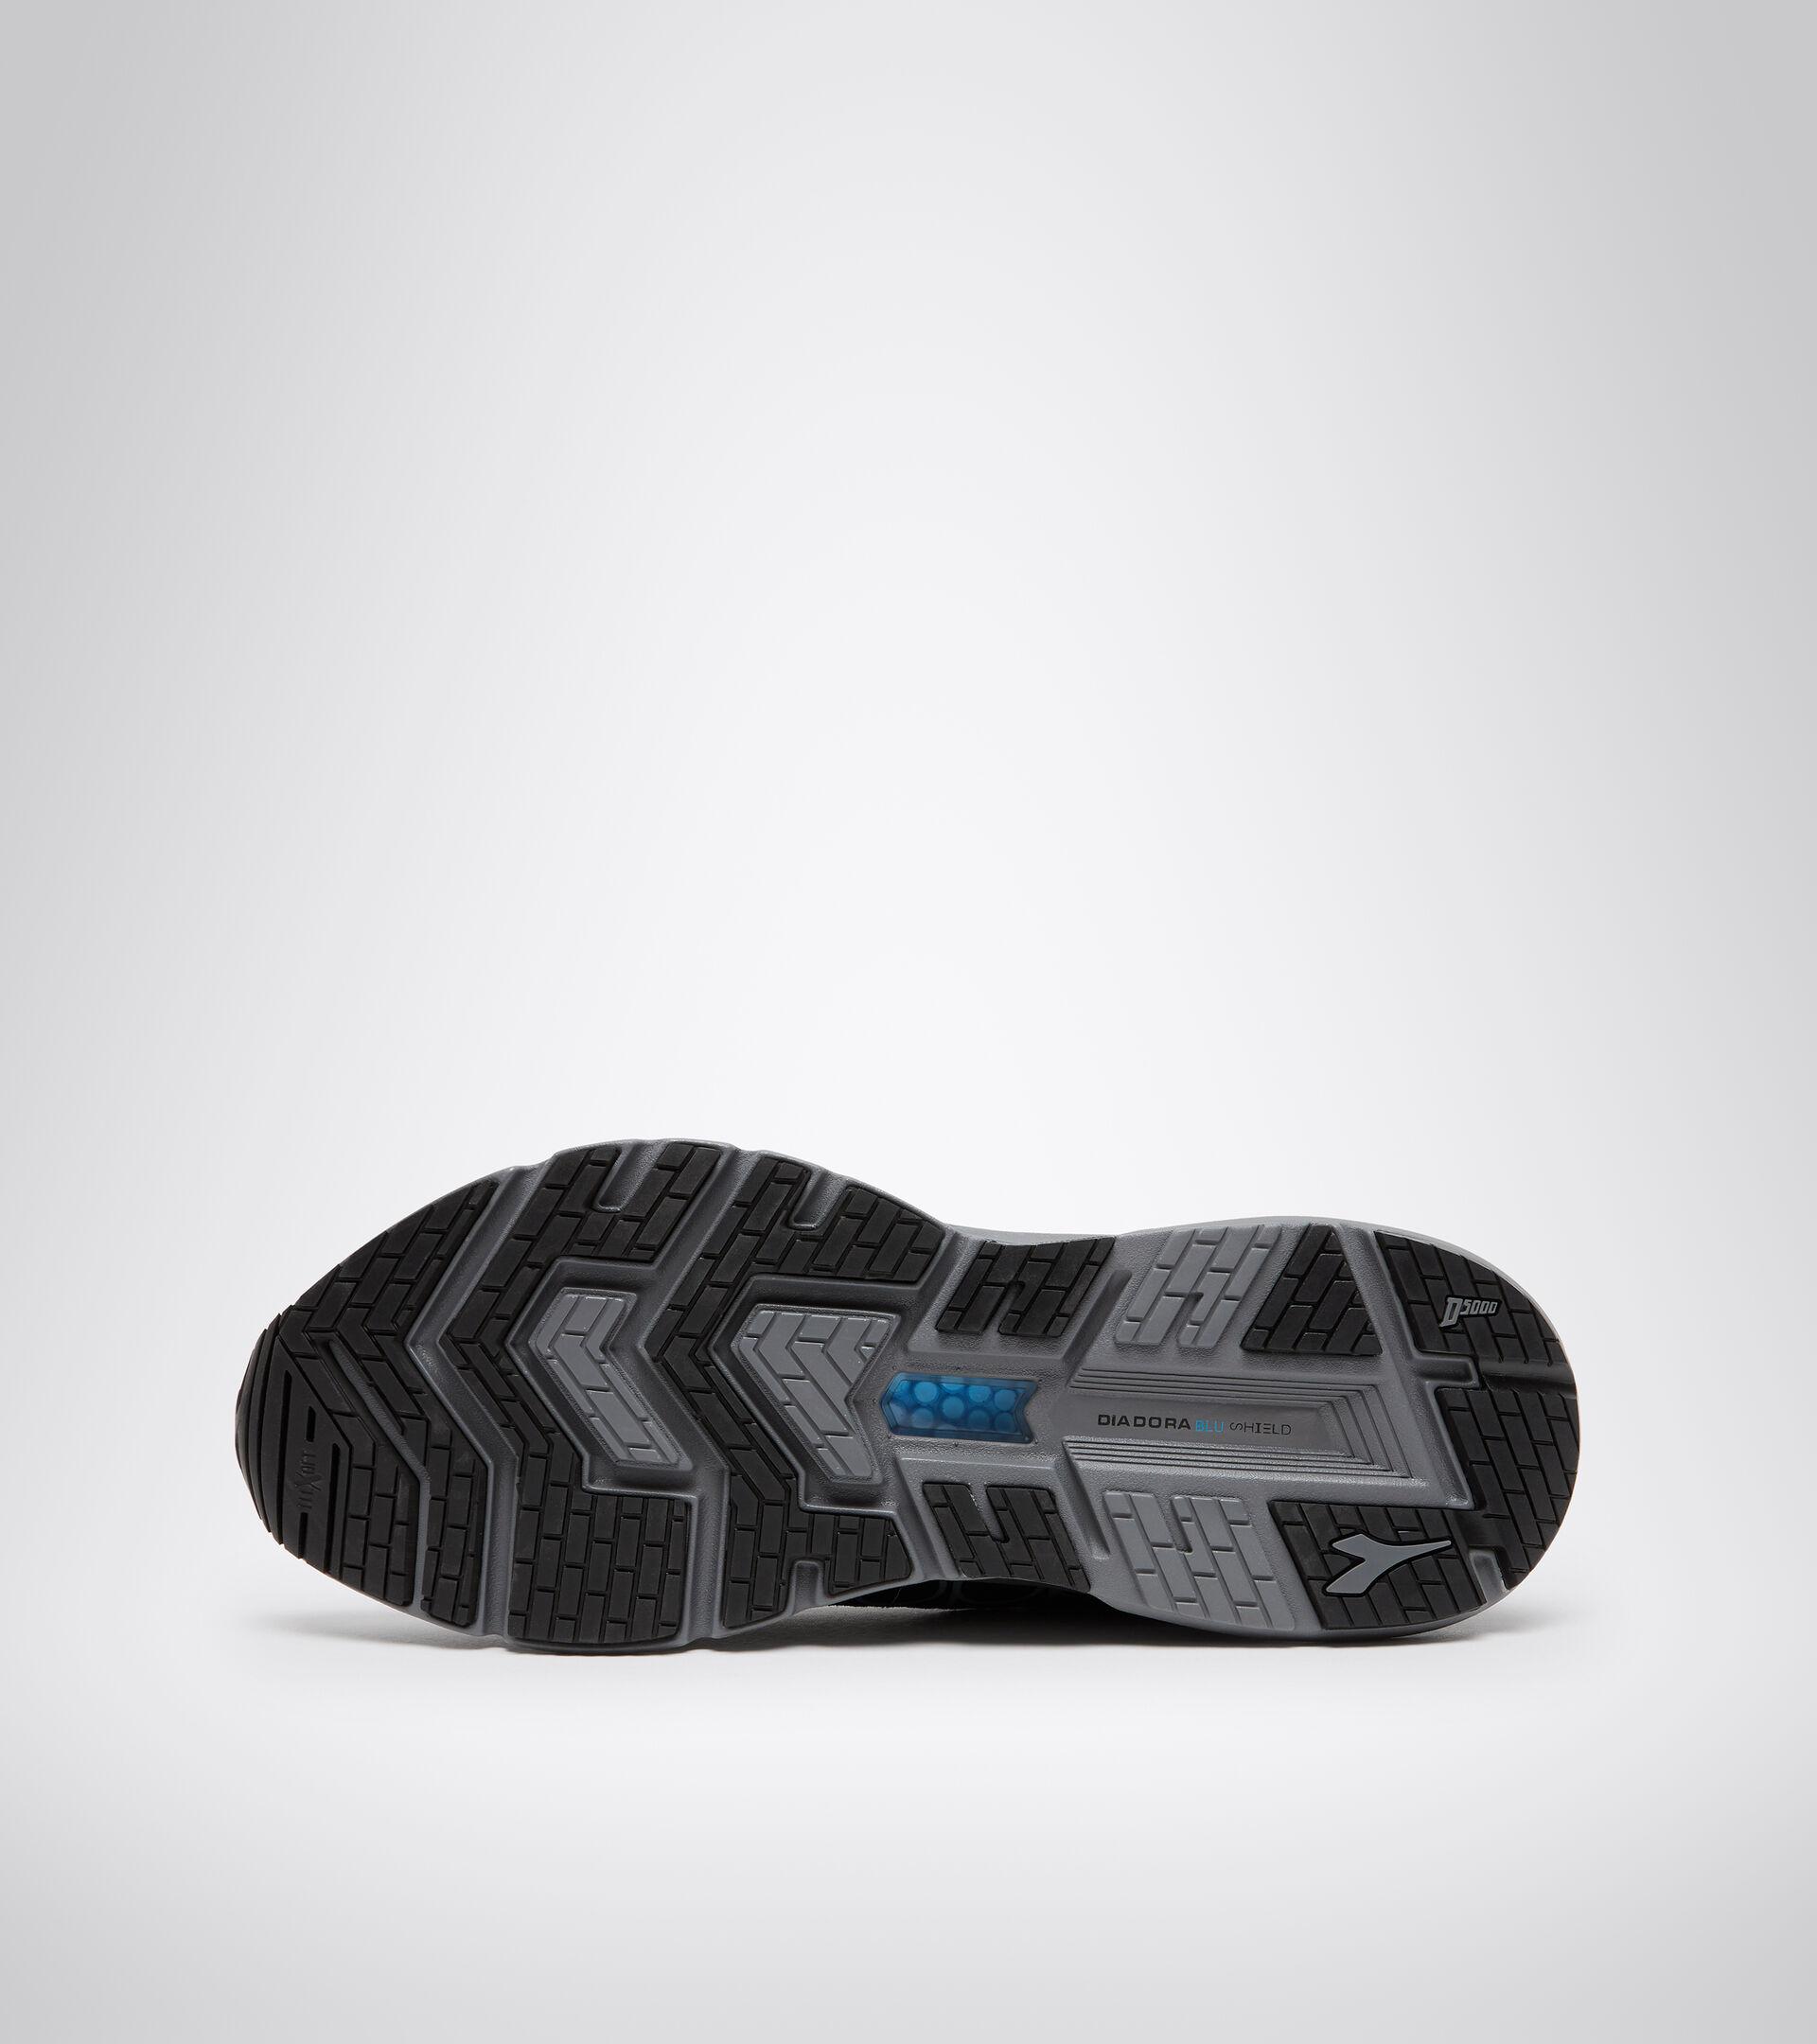 Footwear Sport UOMO MYTHOS BLUSHIELD VOLO HIP BLACK/STEEL GRAY Diadora